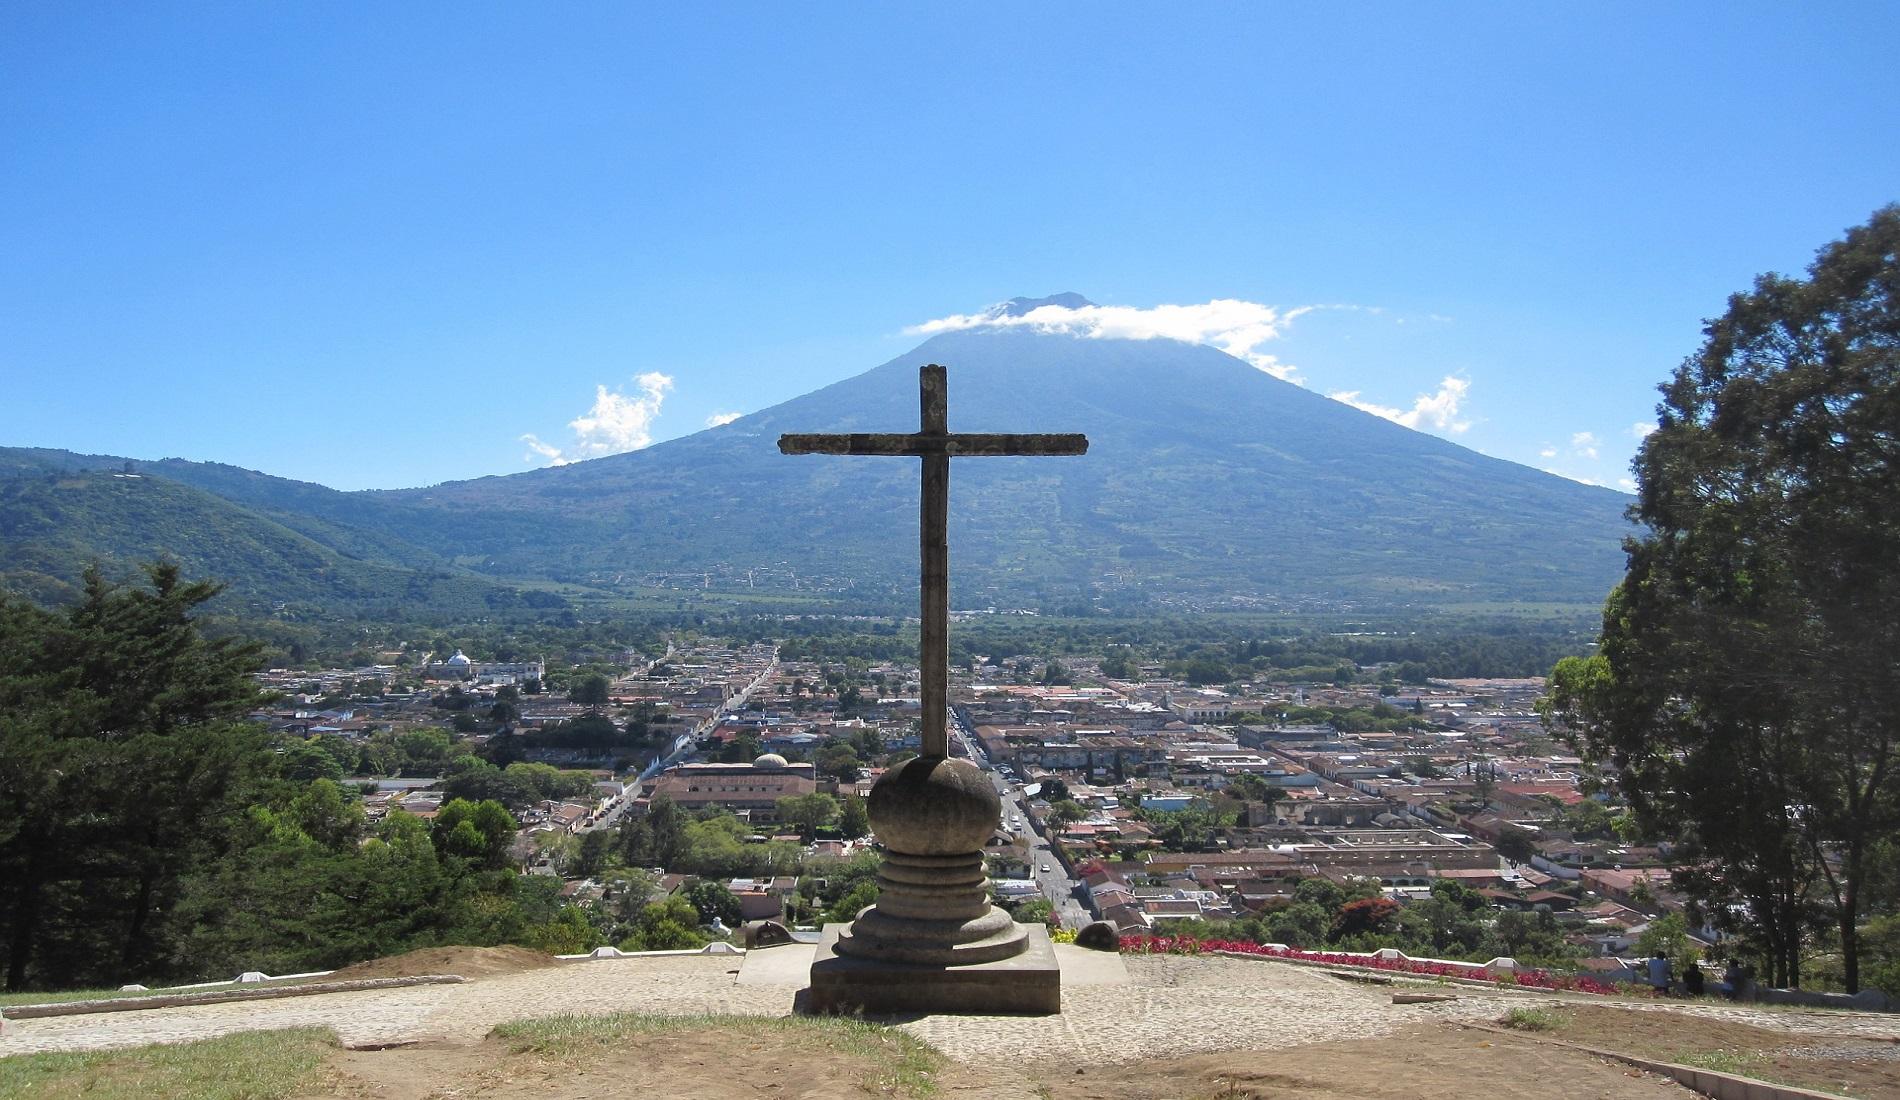 Agua vulkaan luxe reis guatemala